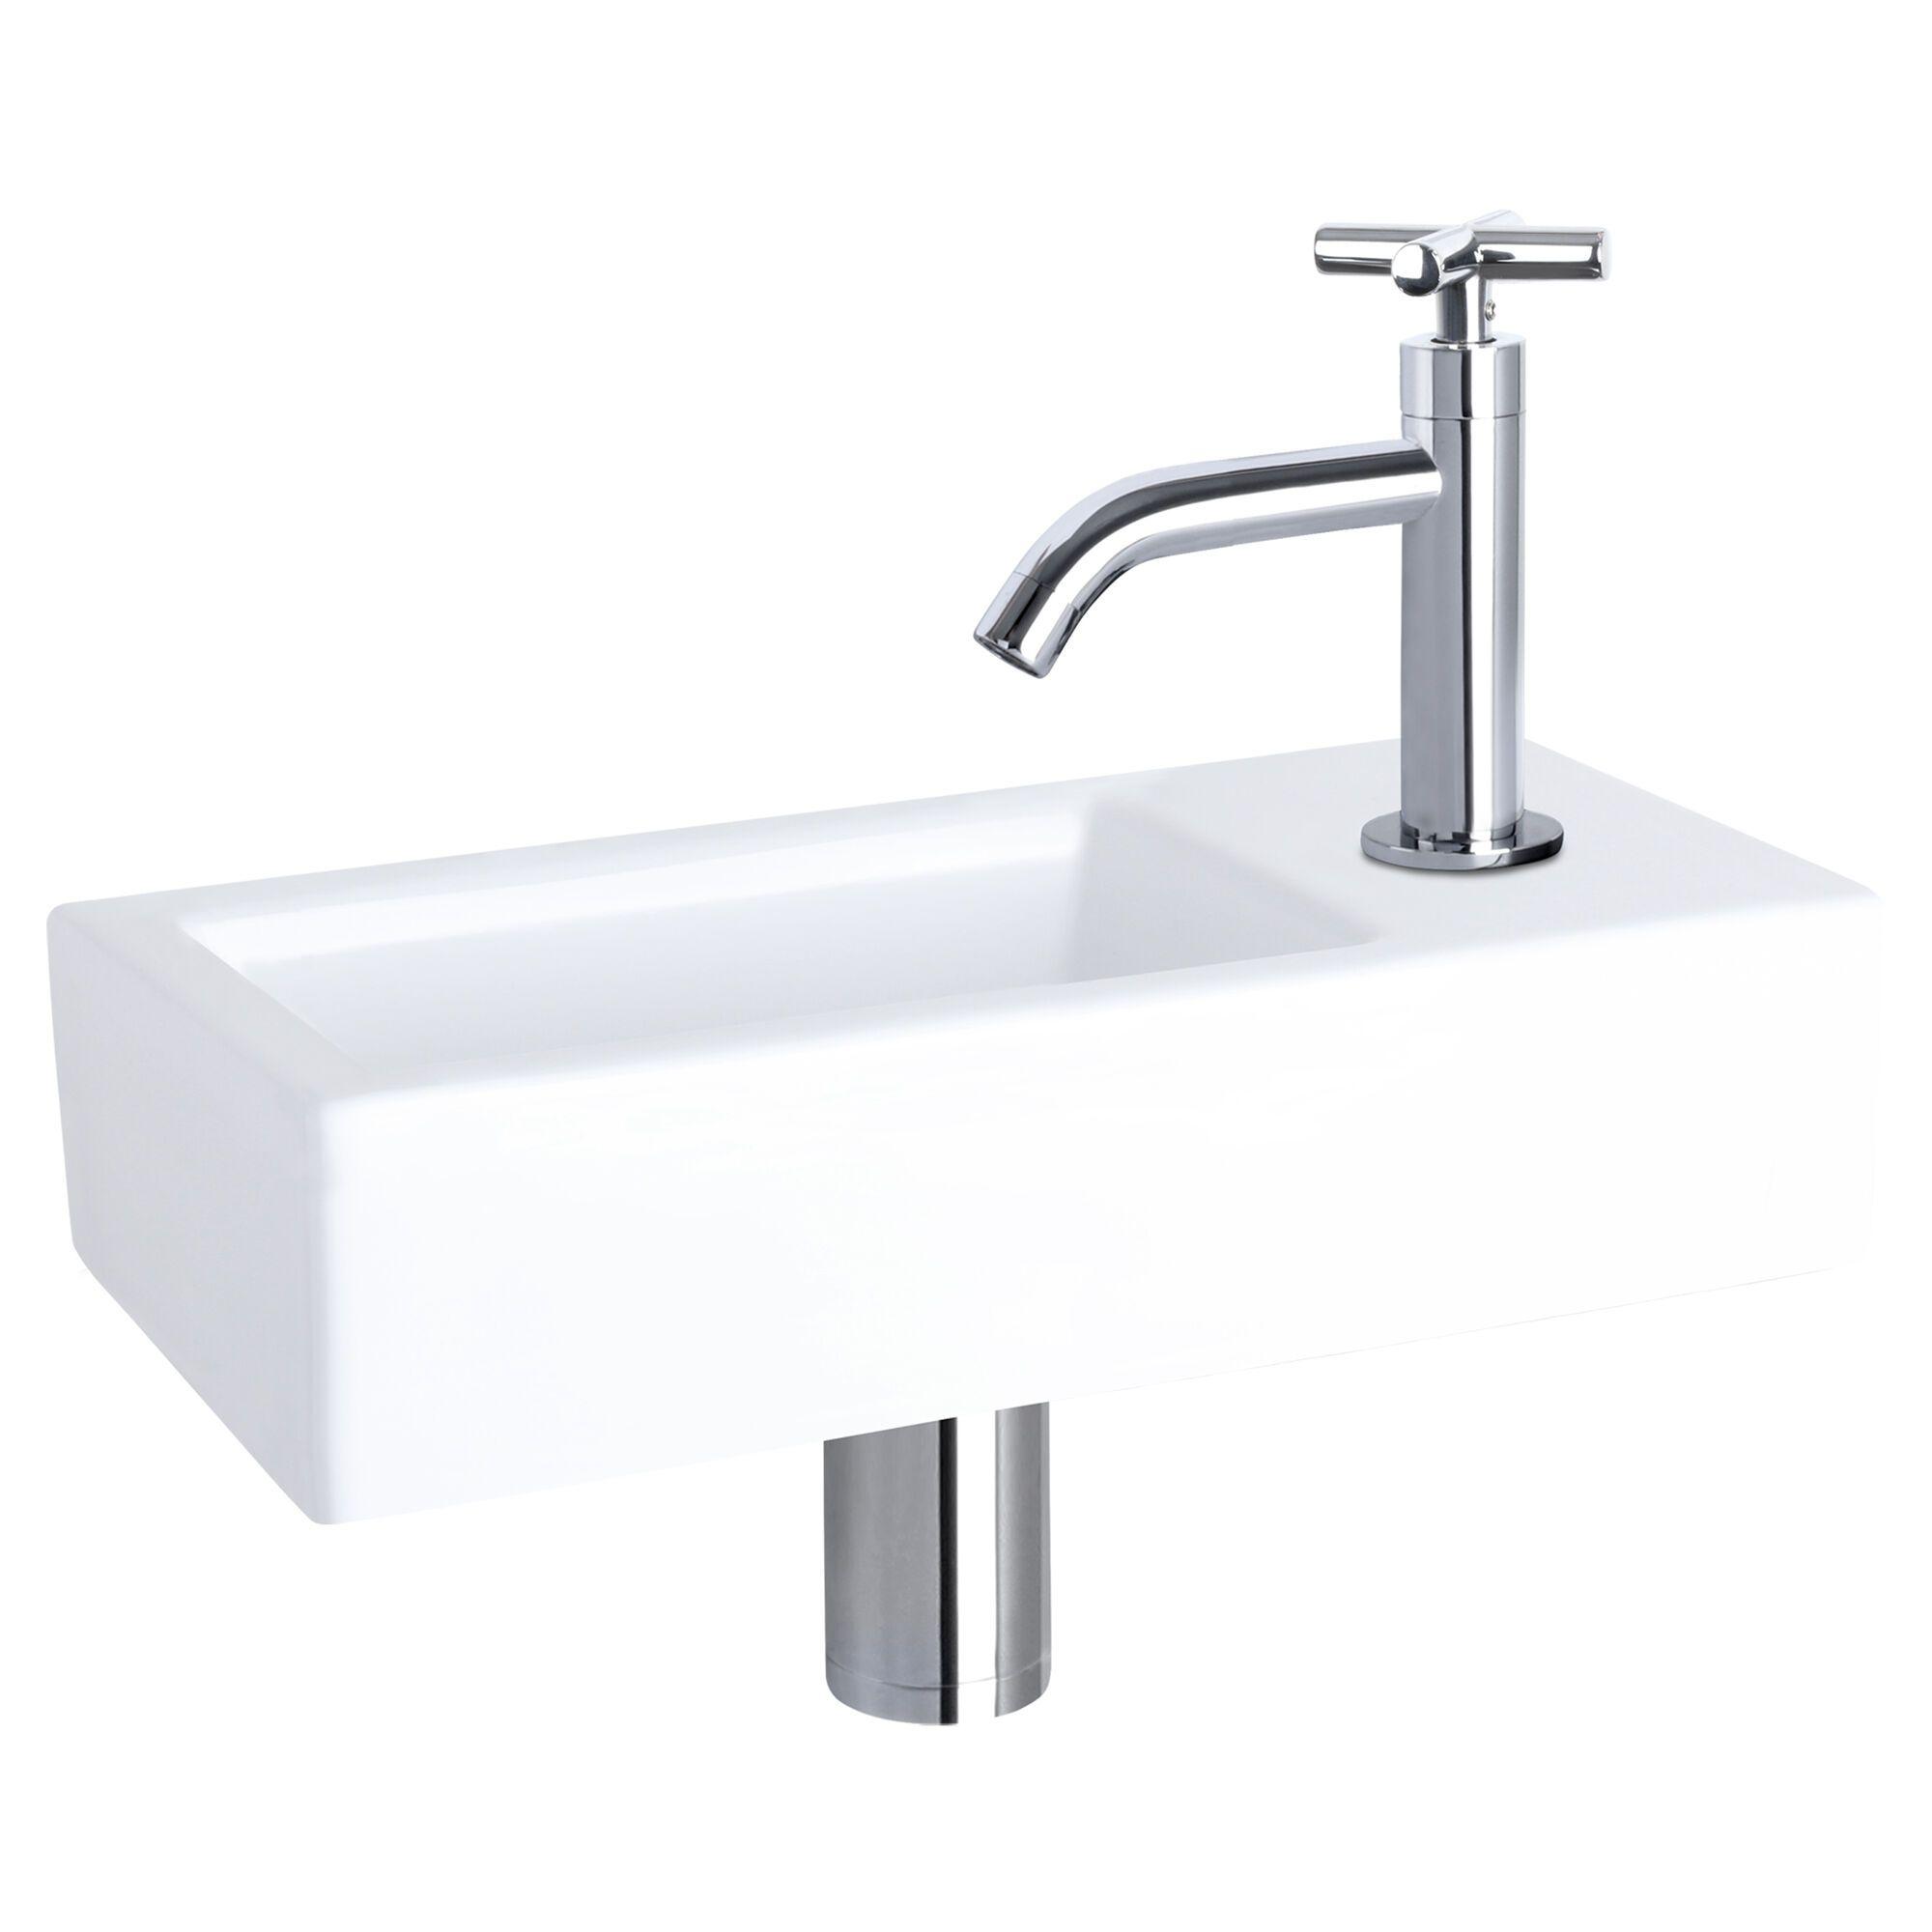 WC Fontein Hura Gebogen Kraan | Fonteinset Wit met Chroom | Wastafel WC